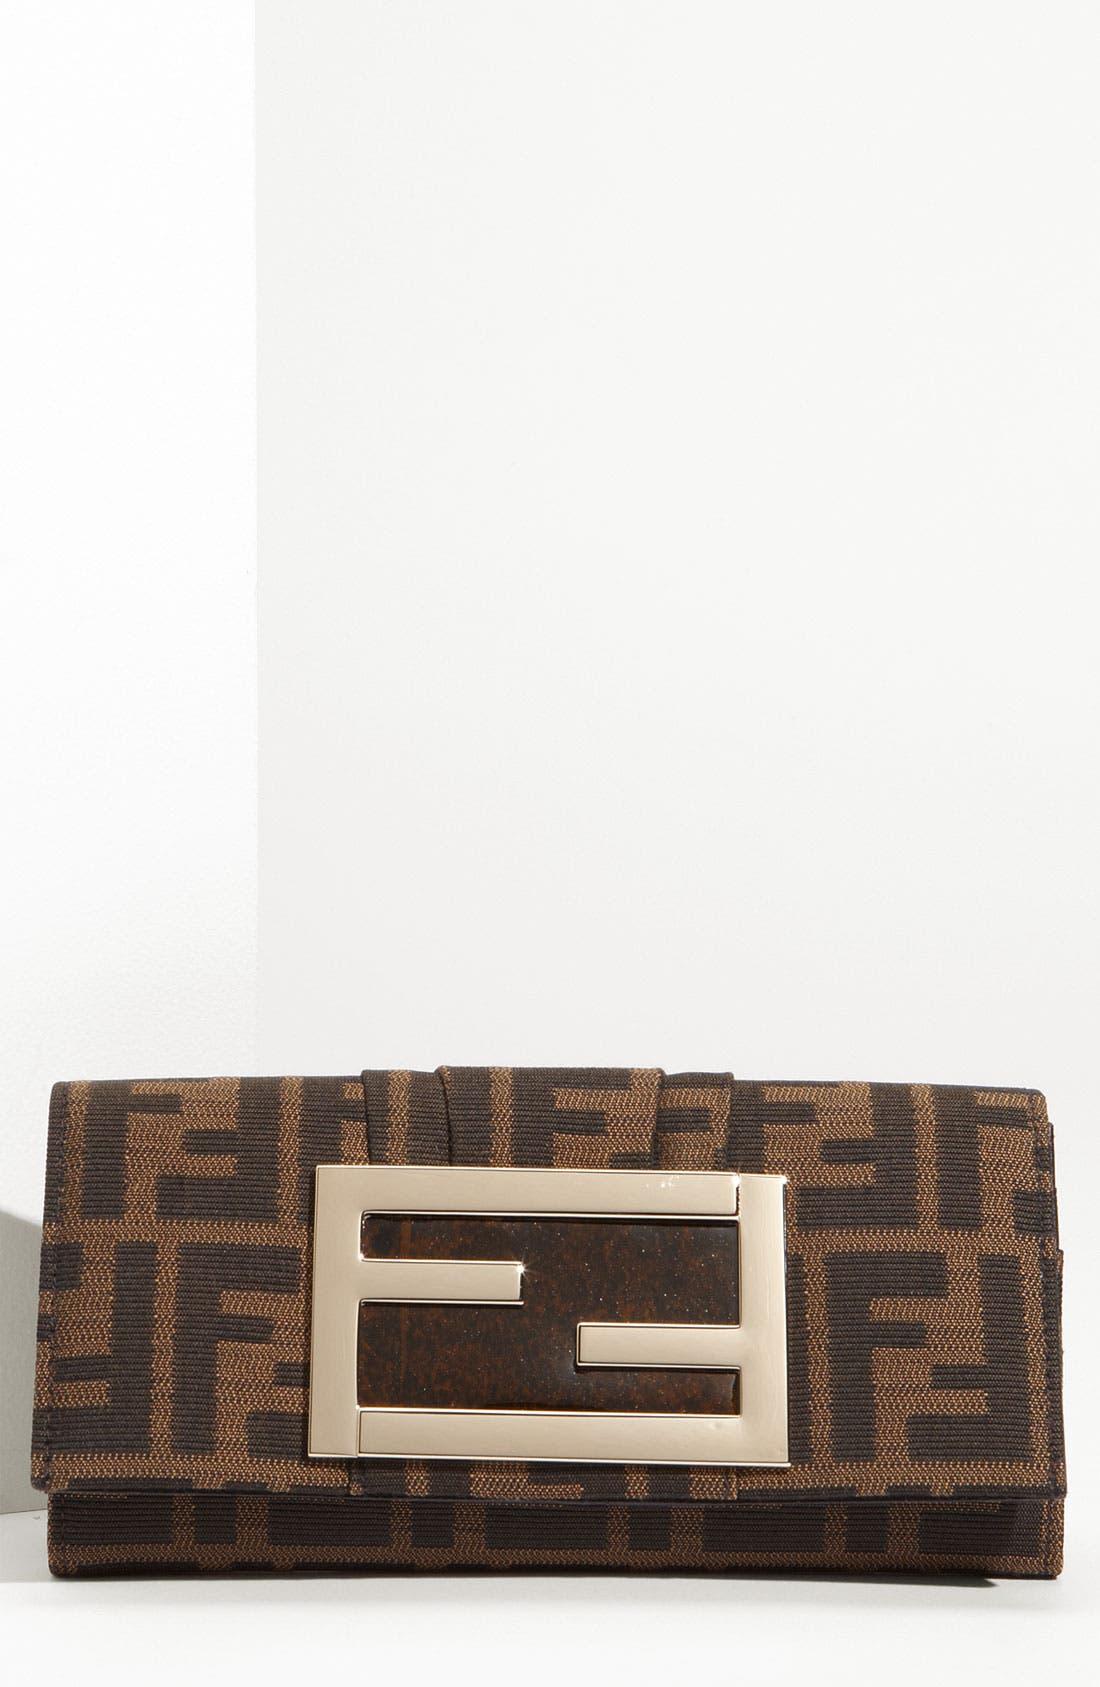 Main Image - Fendi 'Zucca Mia' Clutch Wallet